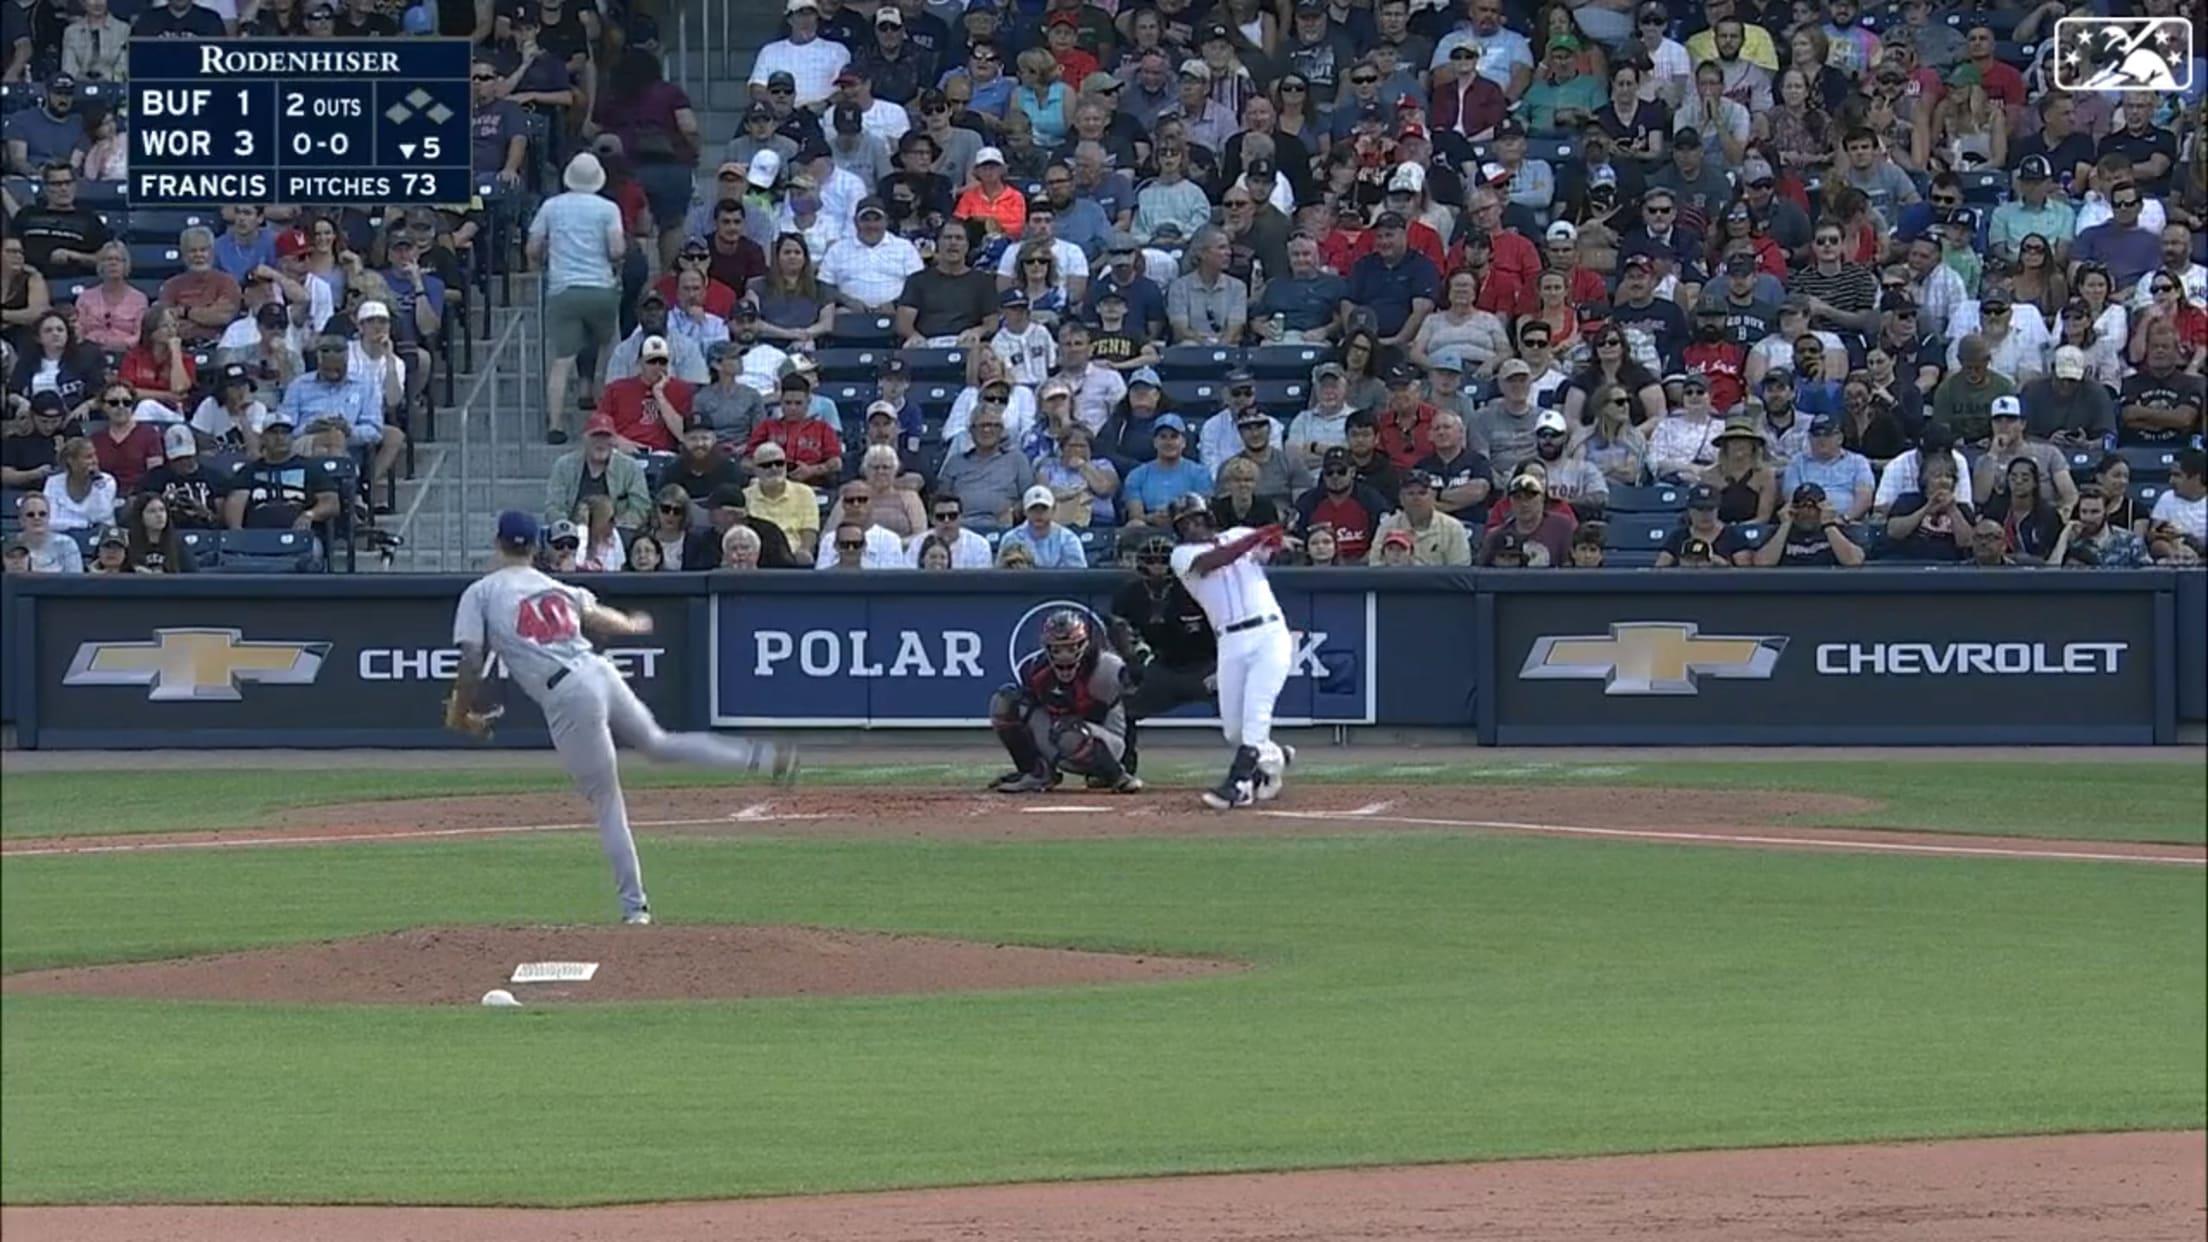 Downs clobbers his ninth homer